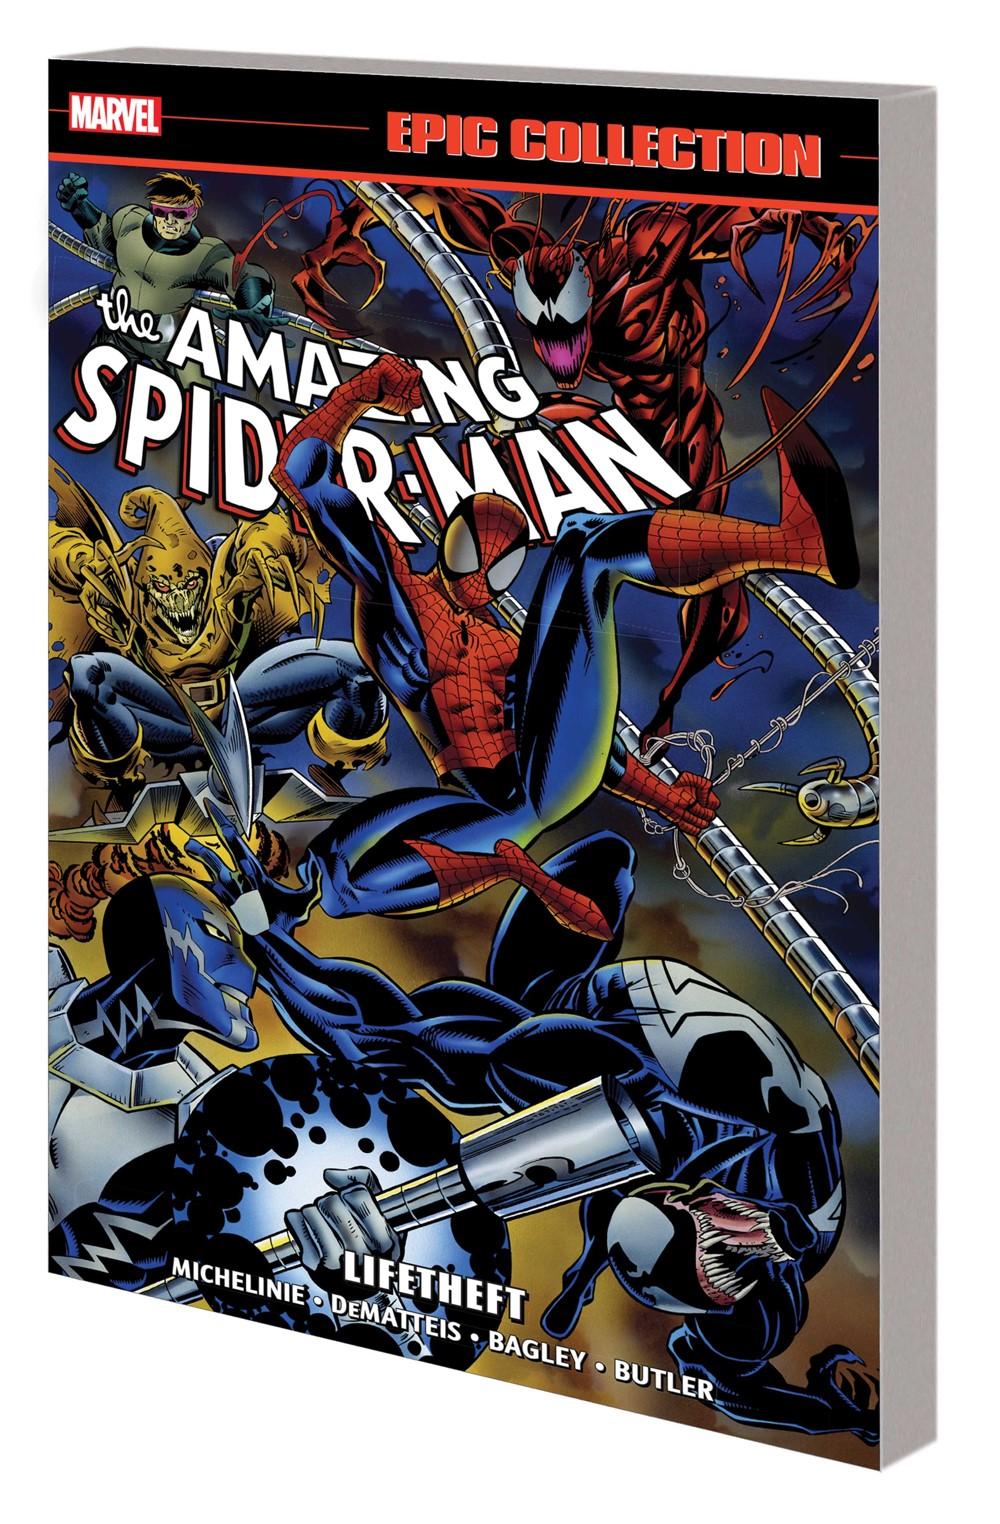 ASMEPIC_V26_TPB Marvel Comics September 2021 Solicitations